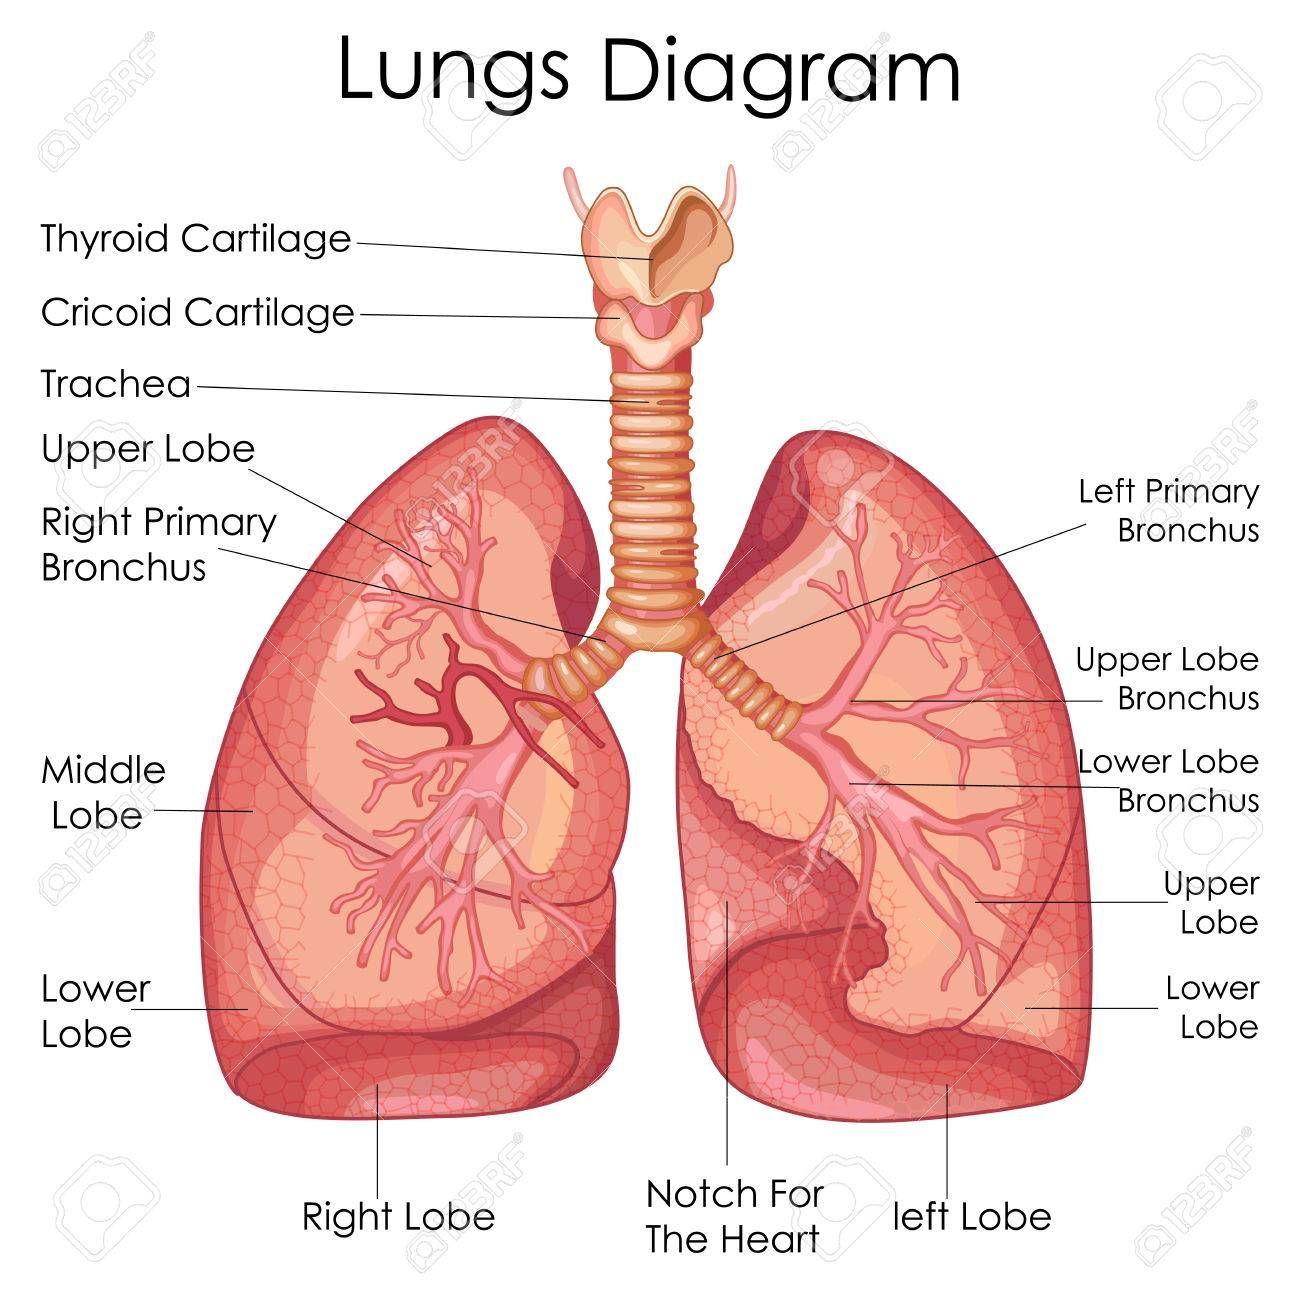 lungs diagram  [ 1300 x 1299 Pixel ]